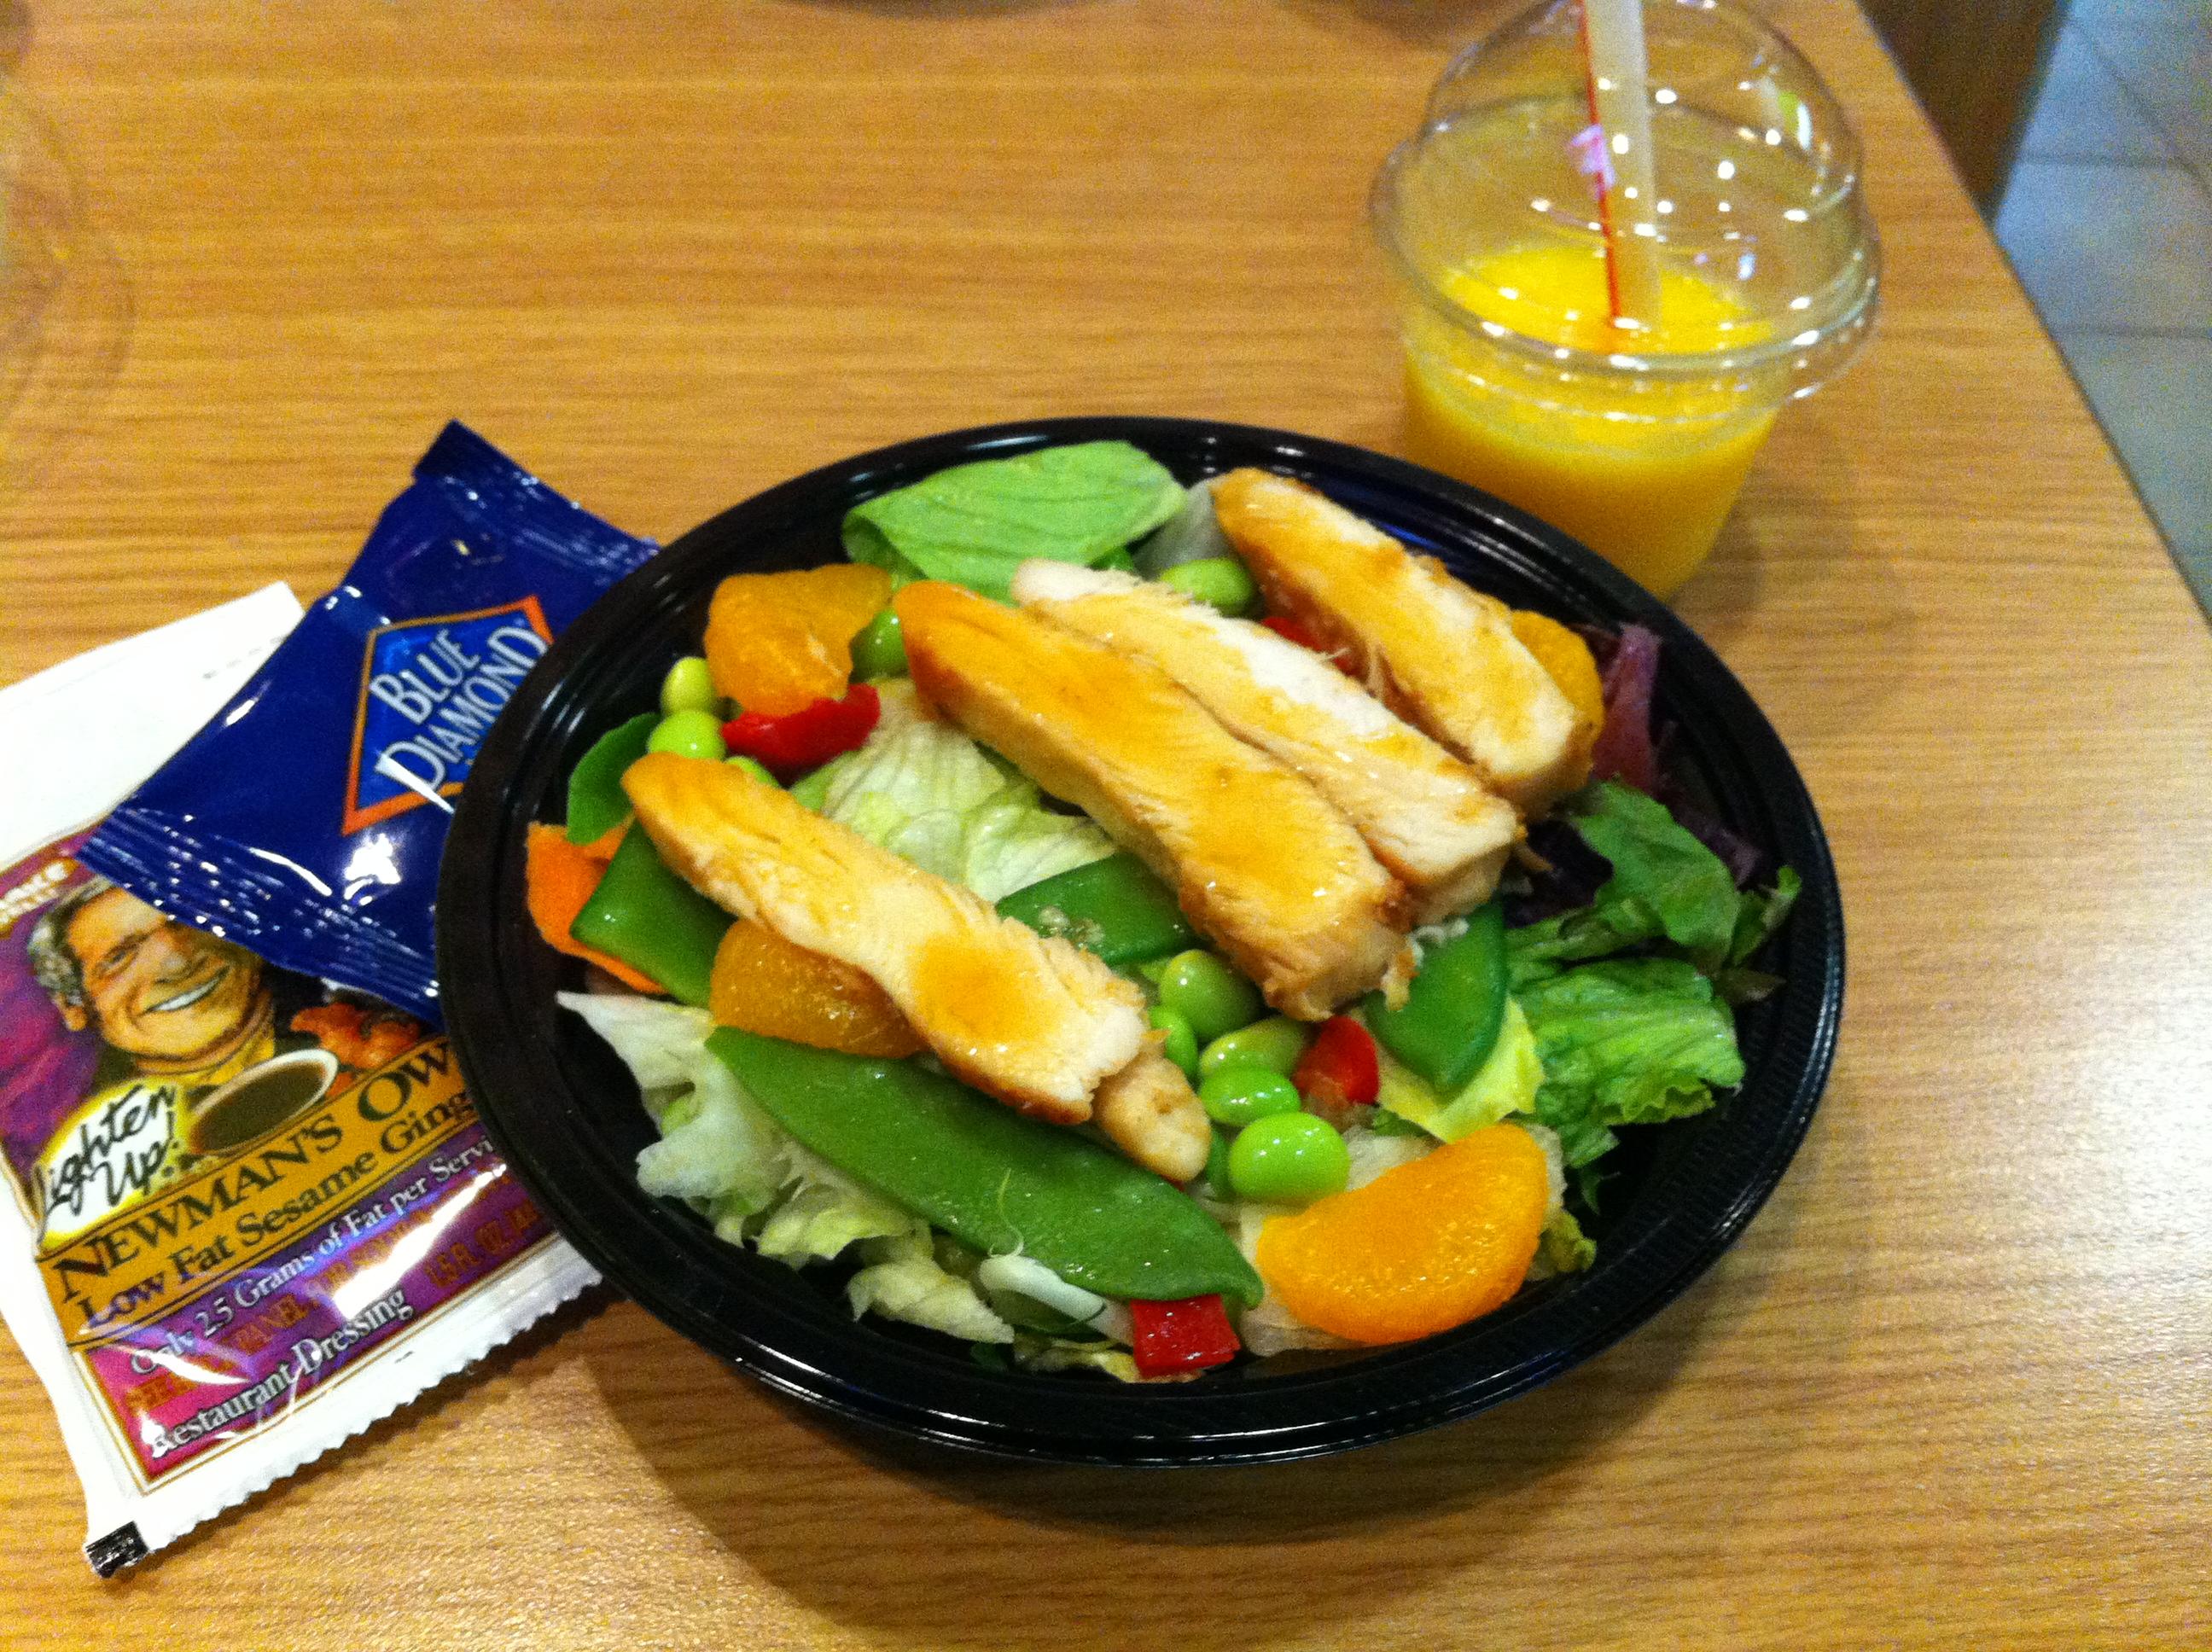 Asian calorie in mcdonalds salad